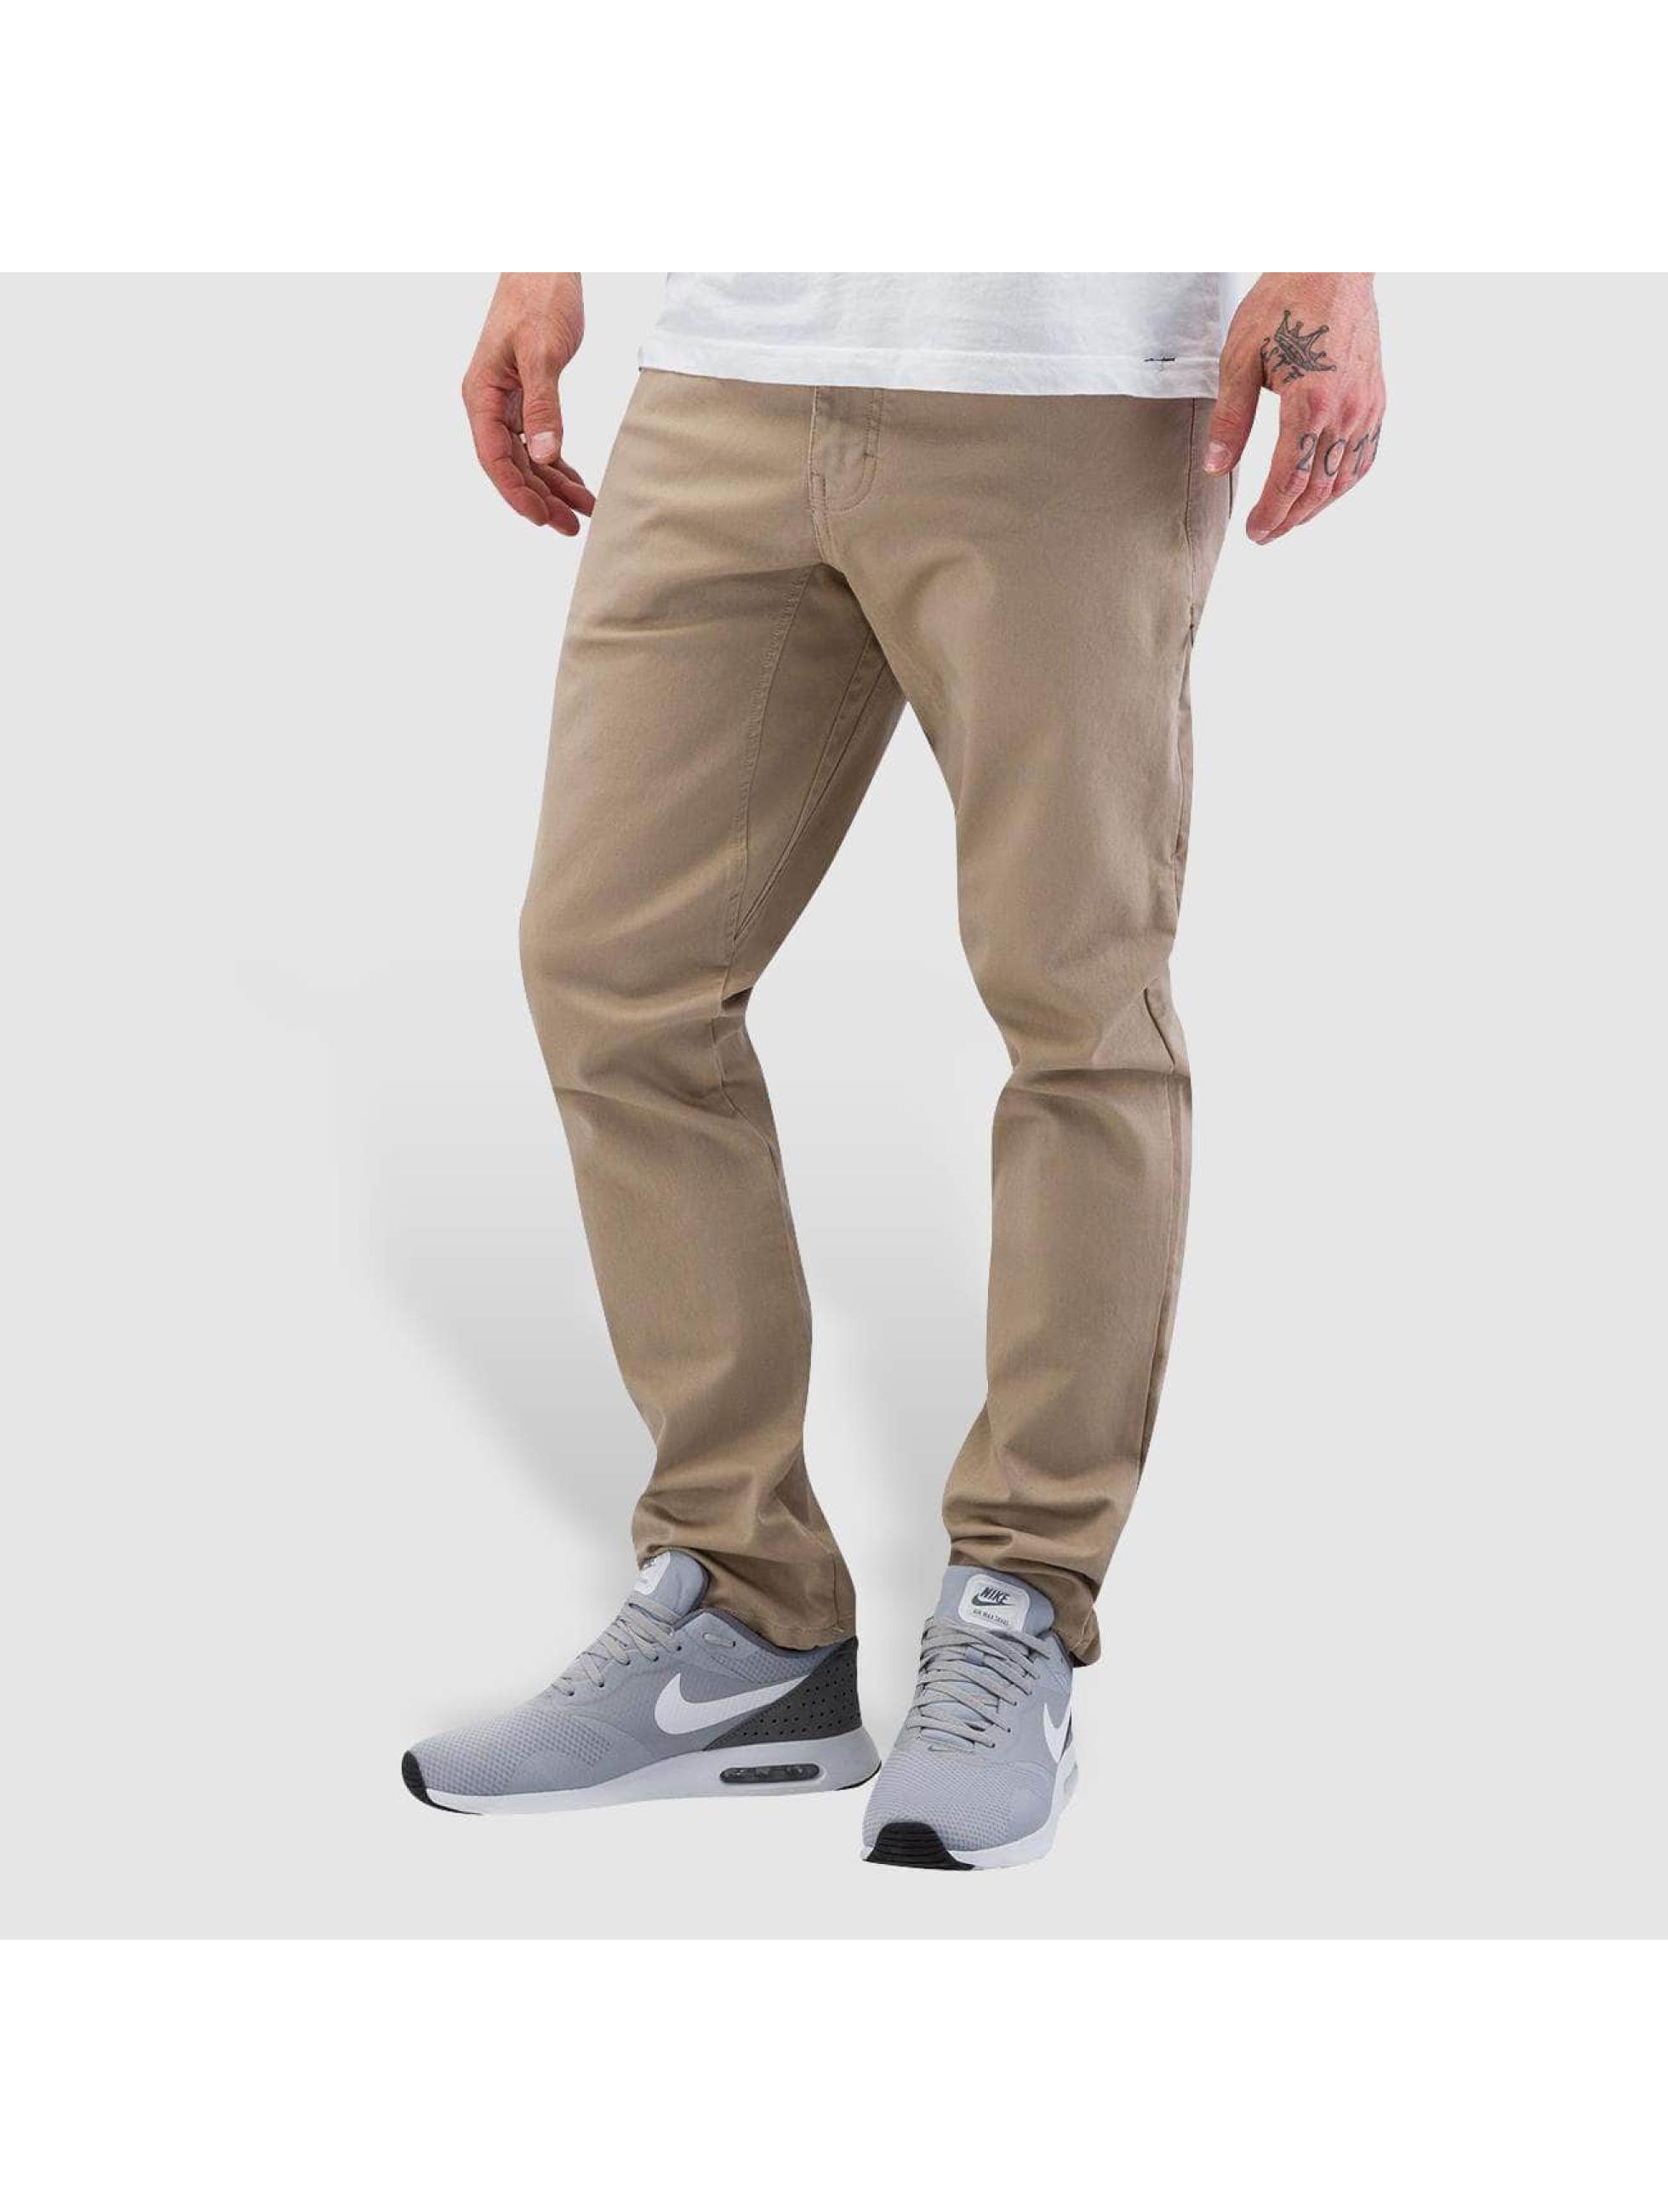 Nike Чинос SB 5 Pocket хаки